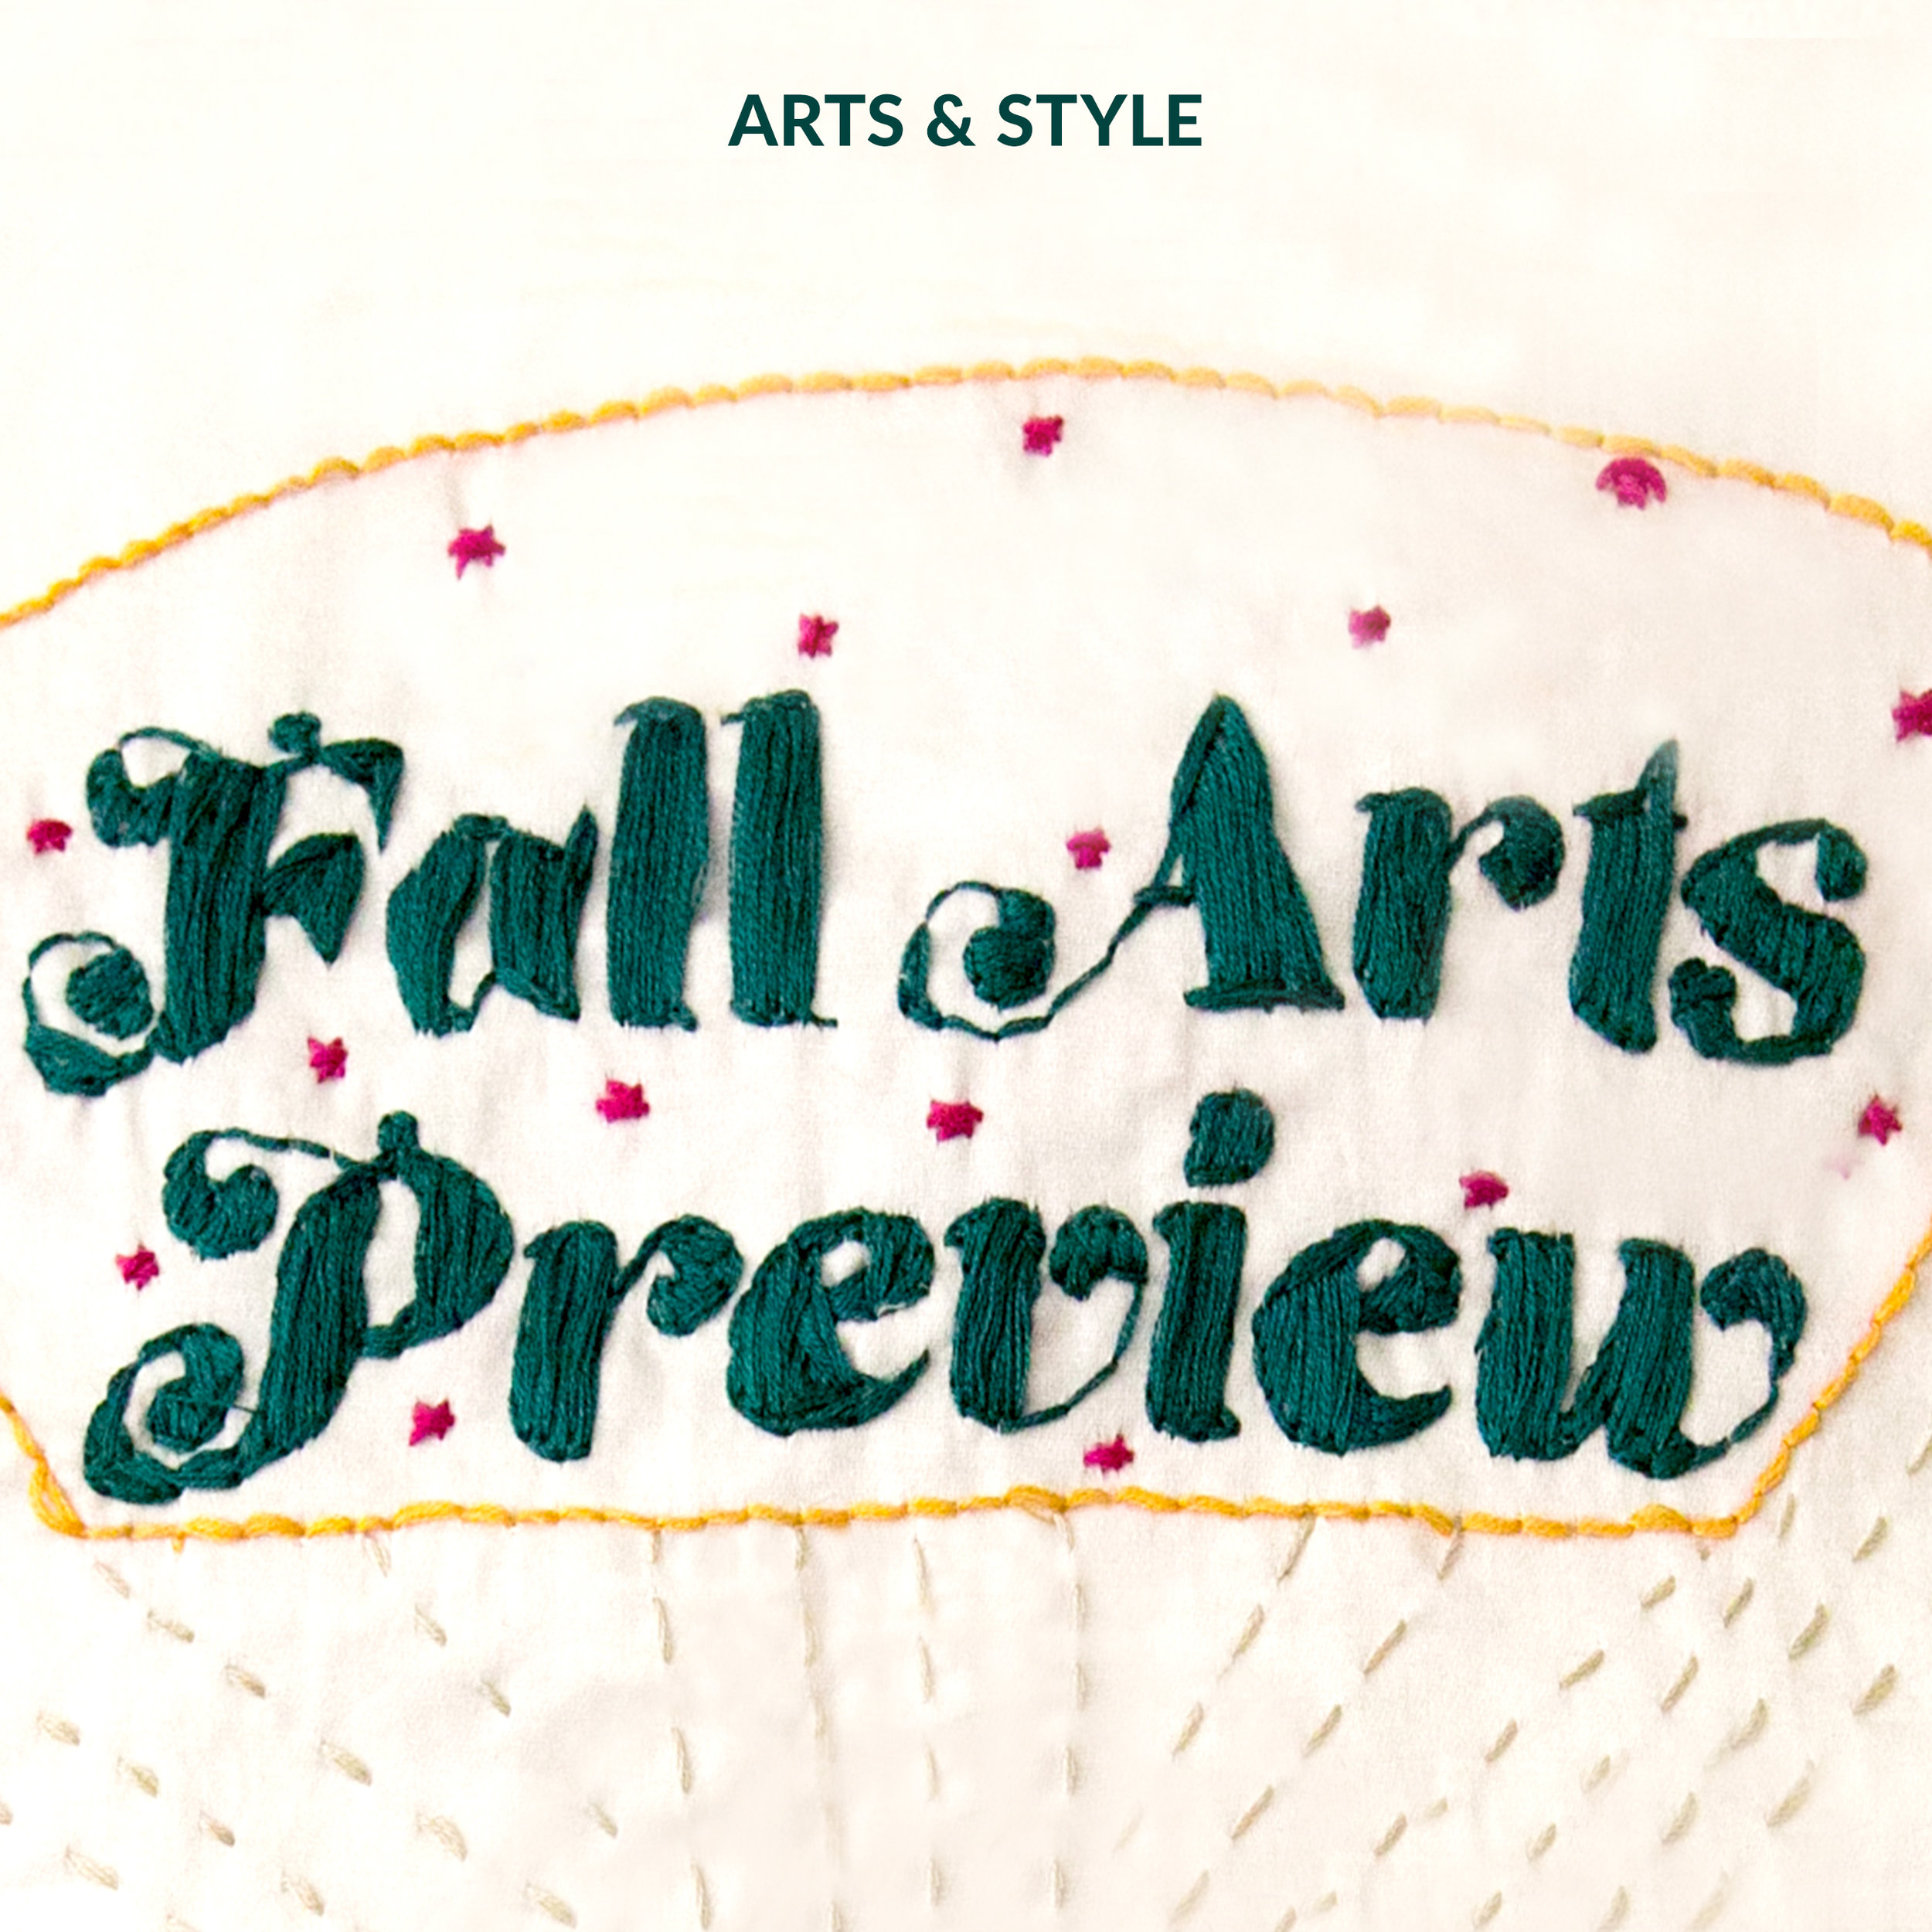 Art Director/Concept  Designer  Crafter